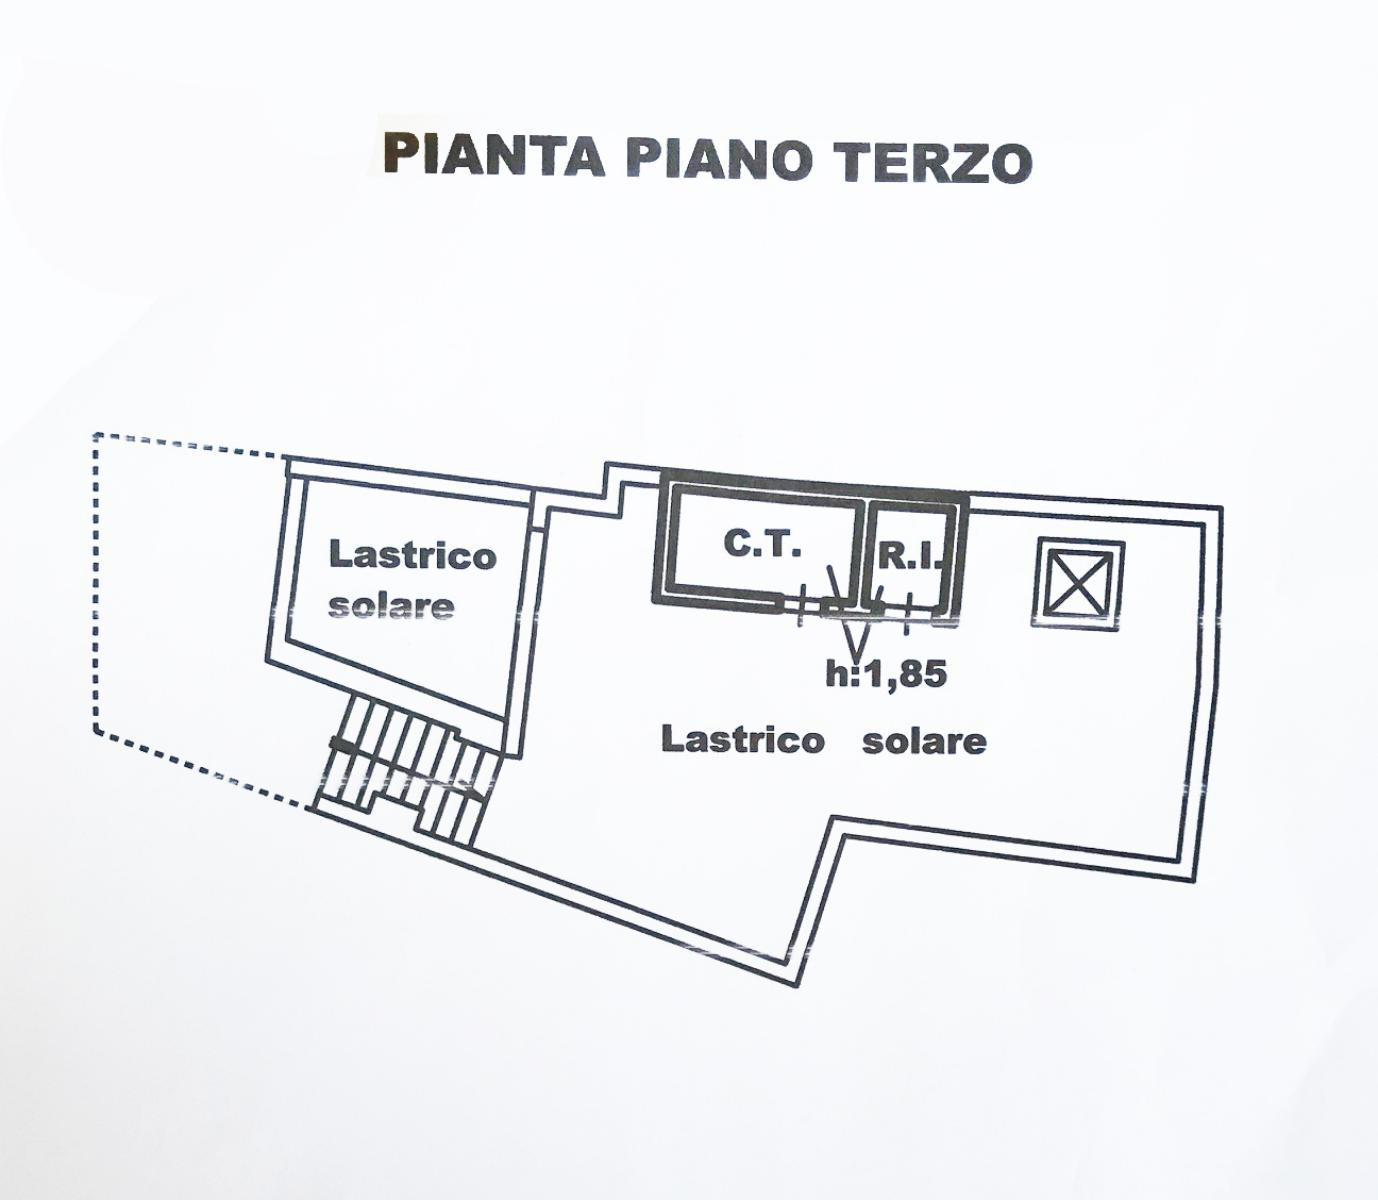 Vendita centro storico – Via Vittorio Veneto, Locorotondo (Bari)